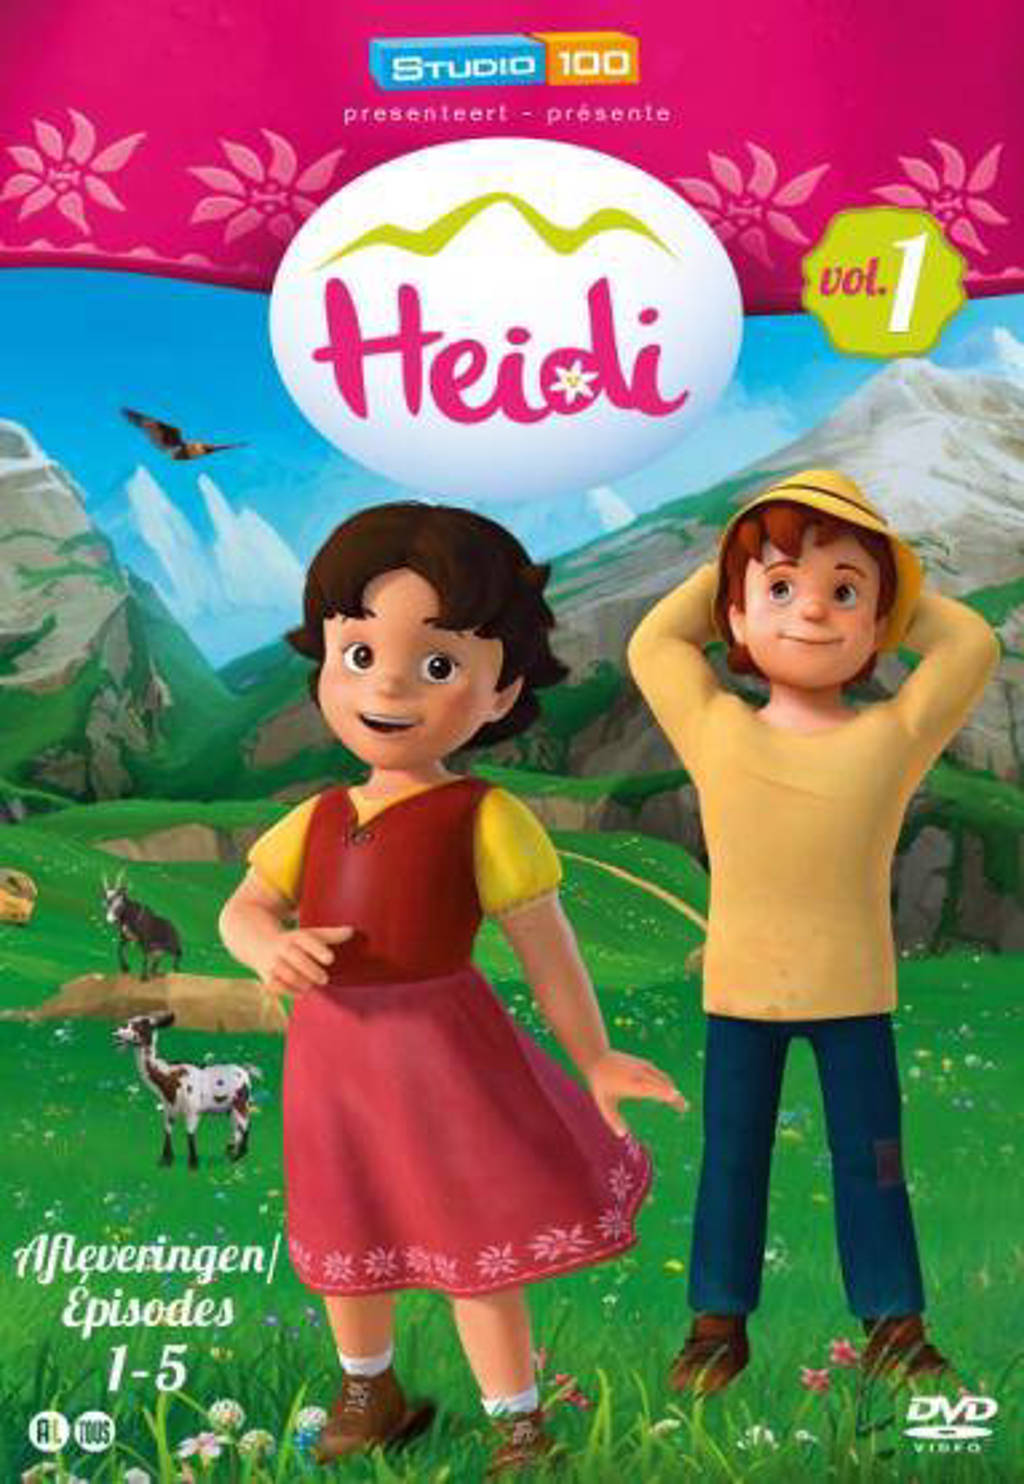 Heidi 1 - Afleveringen 1-5 (DVD)